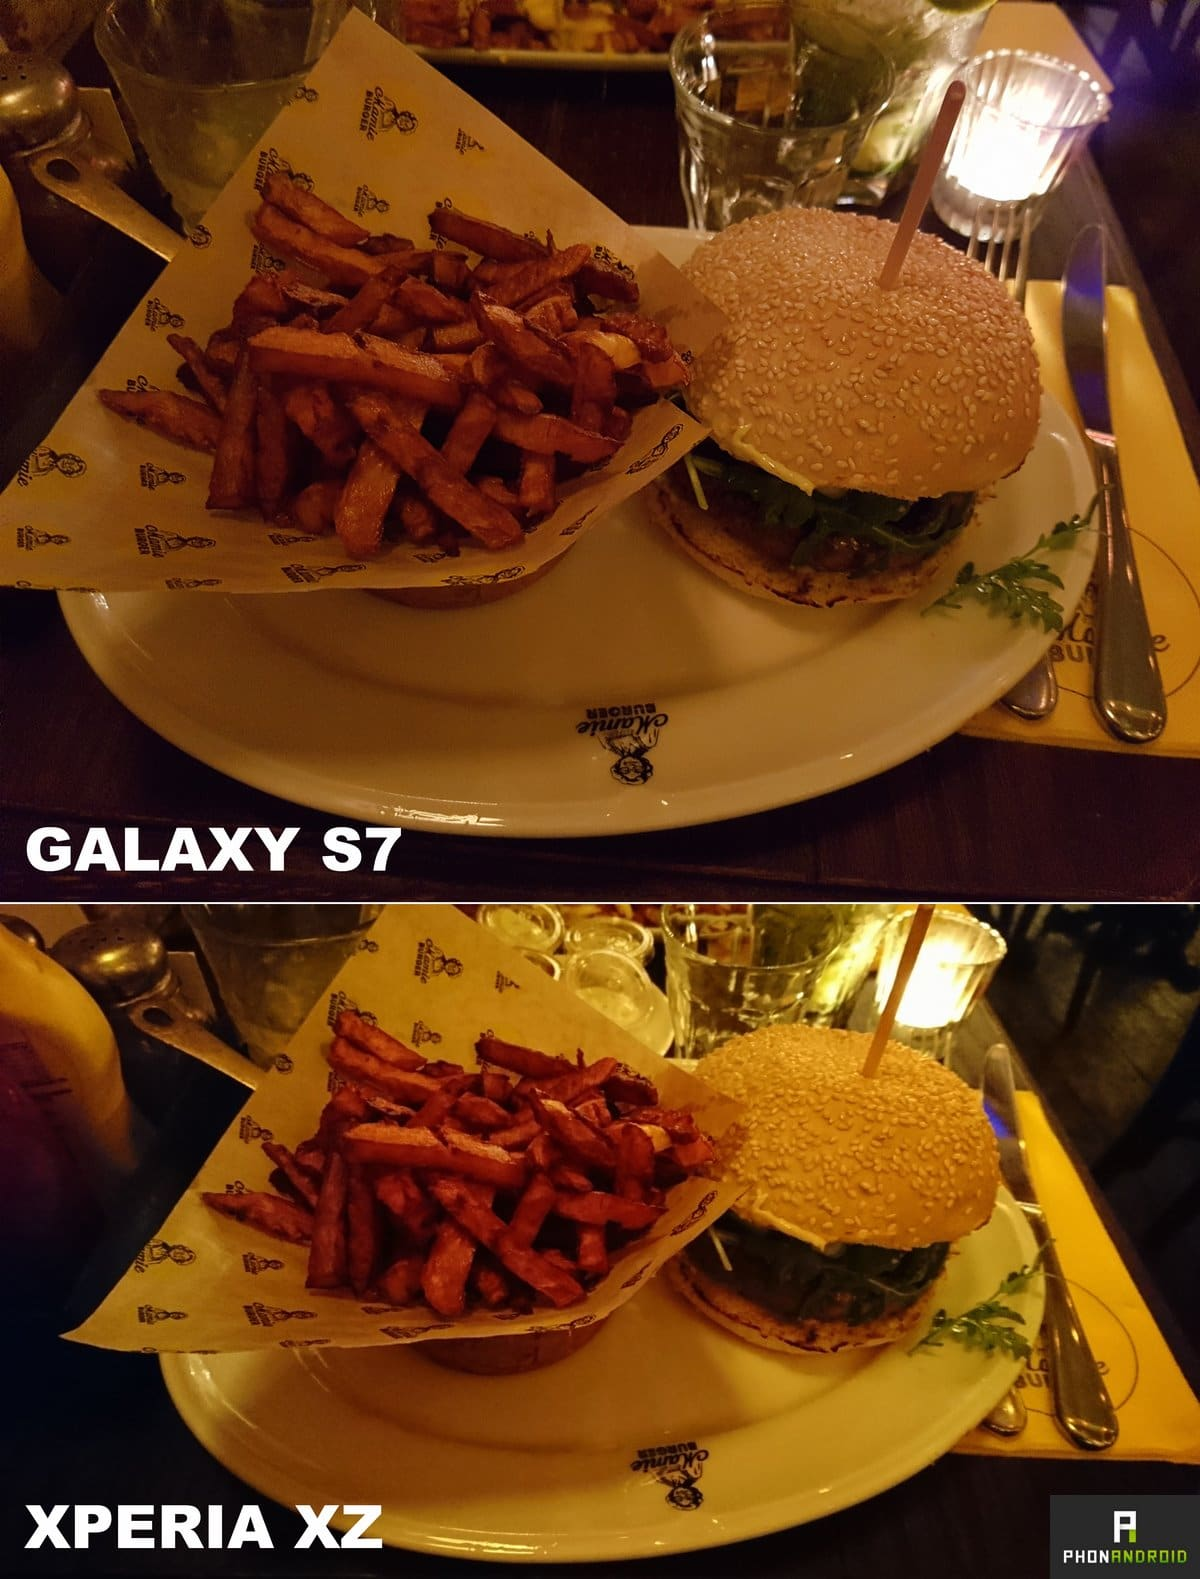 sony-xperia-xz-galaxy-s7-comparatif-photo